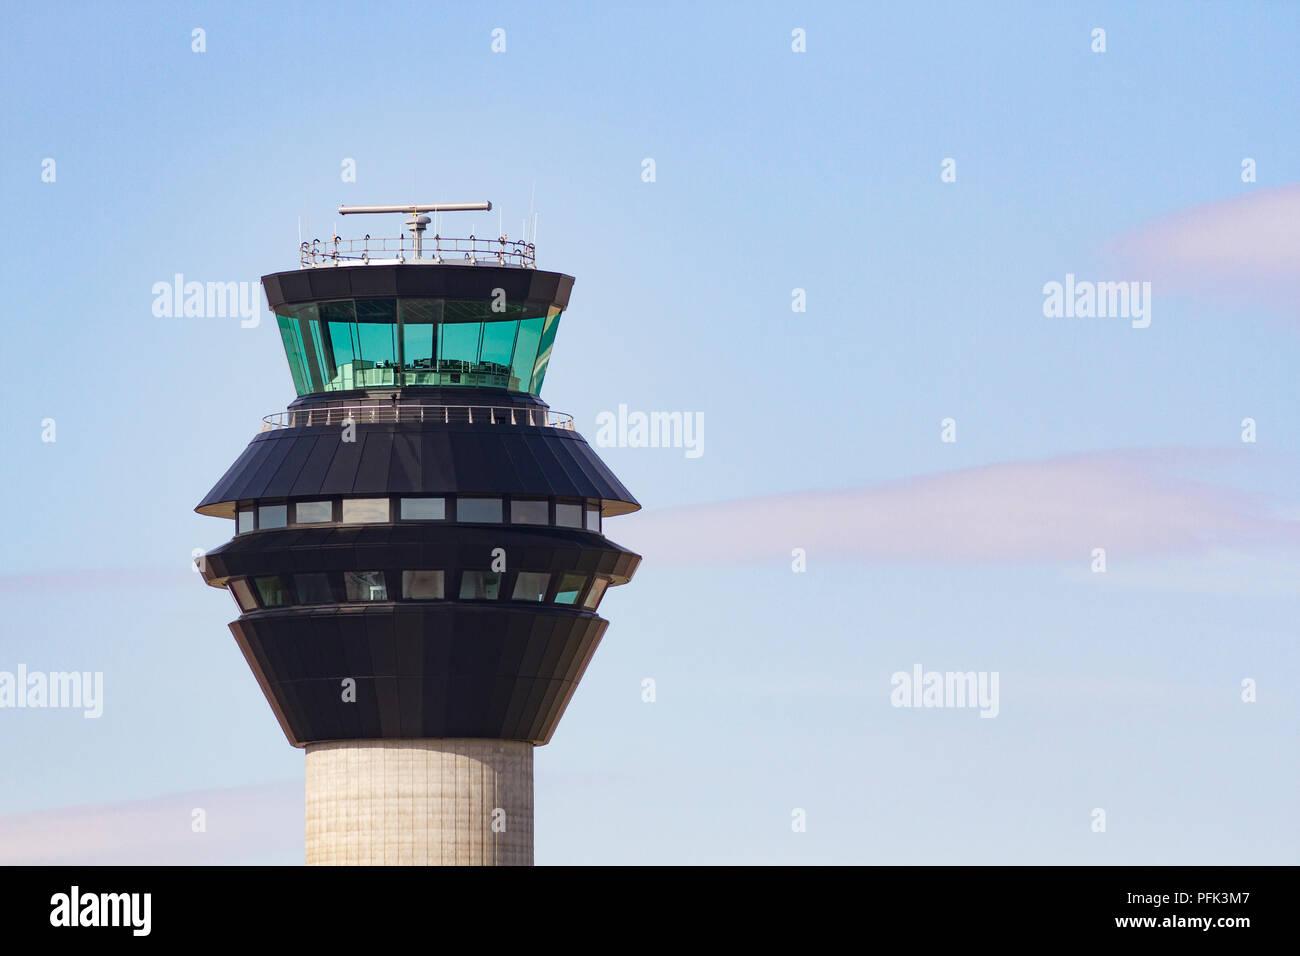 Torre de Control del Aeropuerto de Manchester Foto de stock